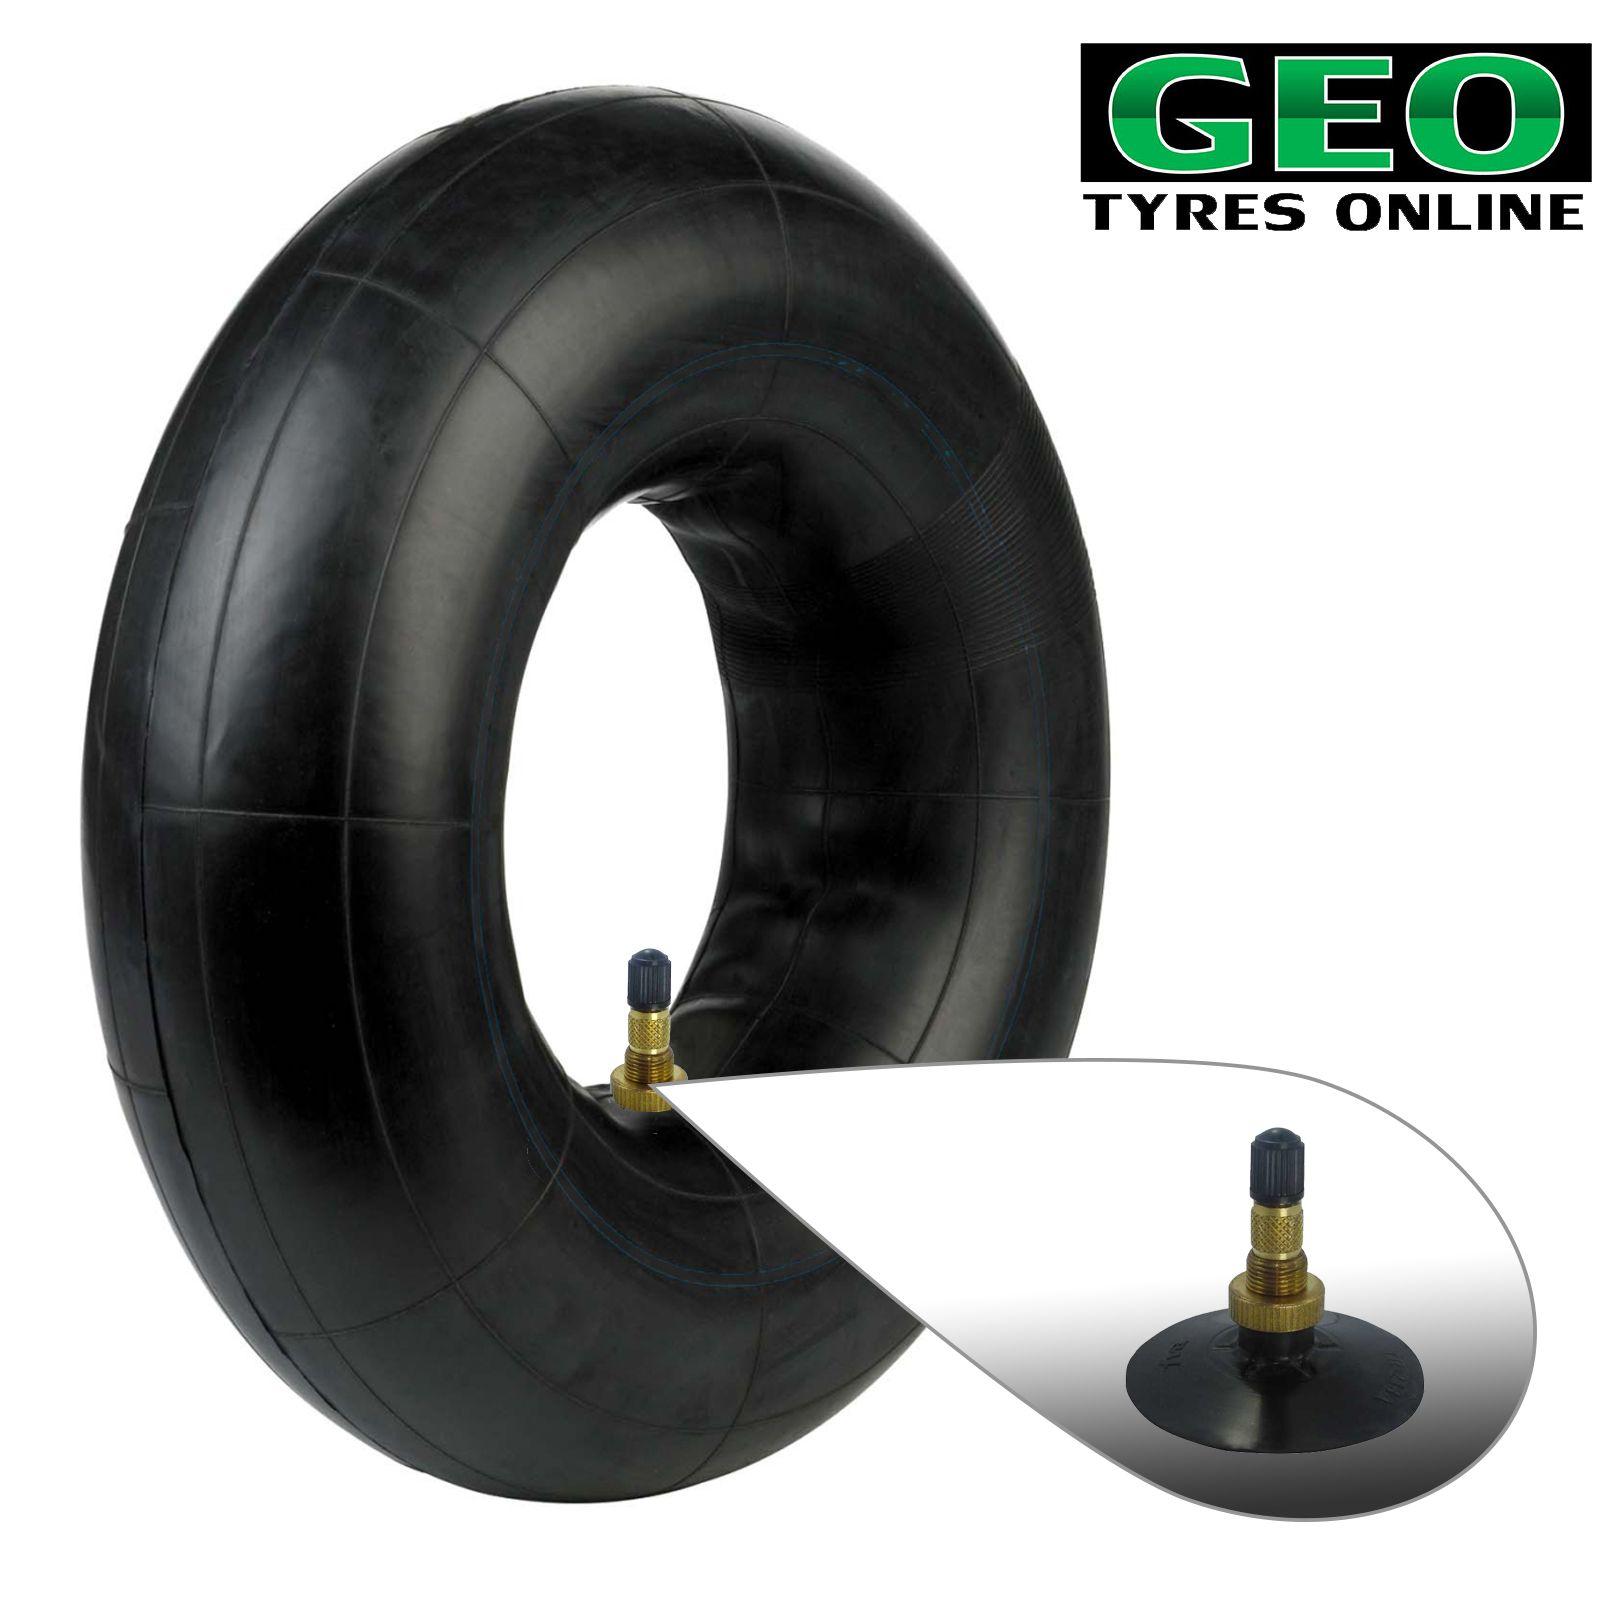 Tire Inner Tube 13.6//15.5R38 TR218A stem *FREE SHIPPING*